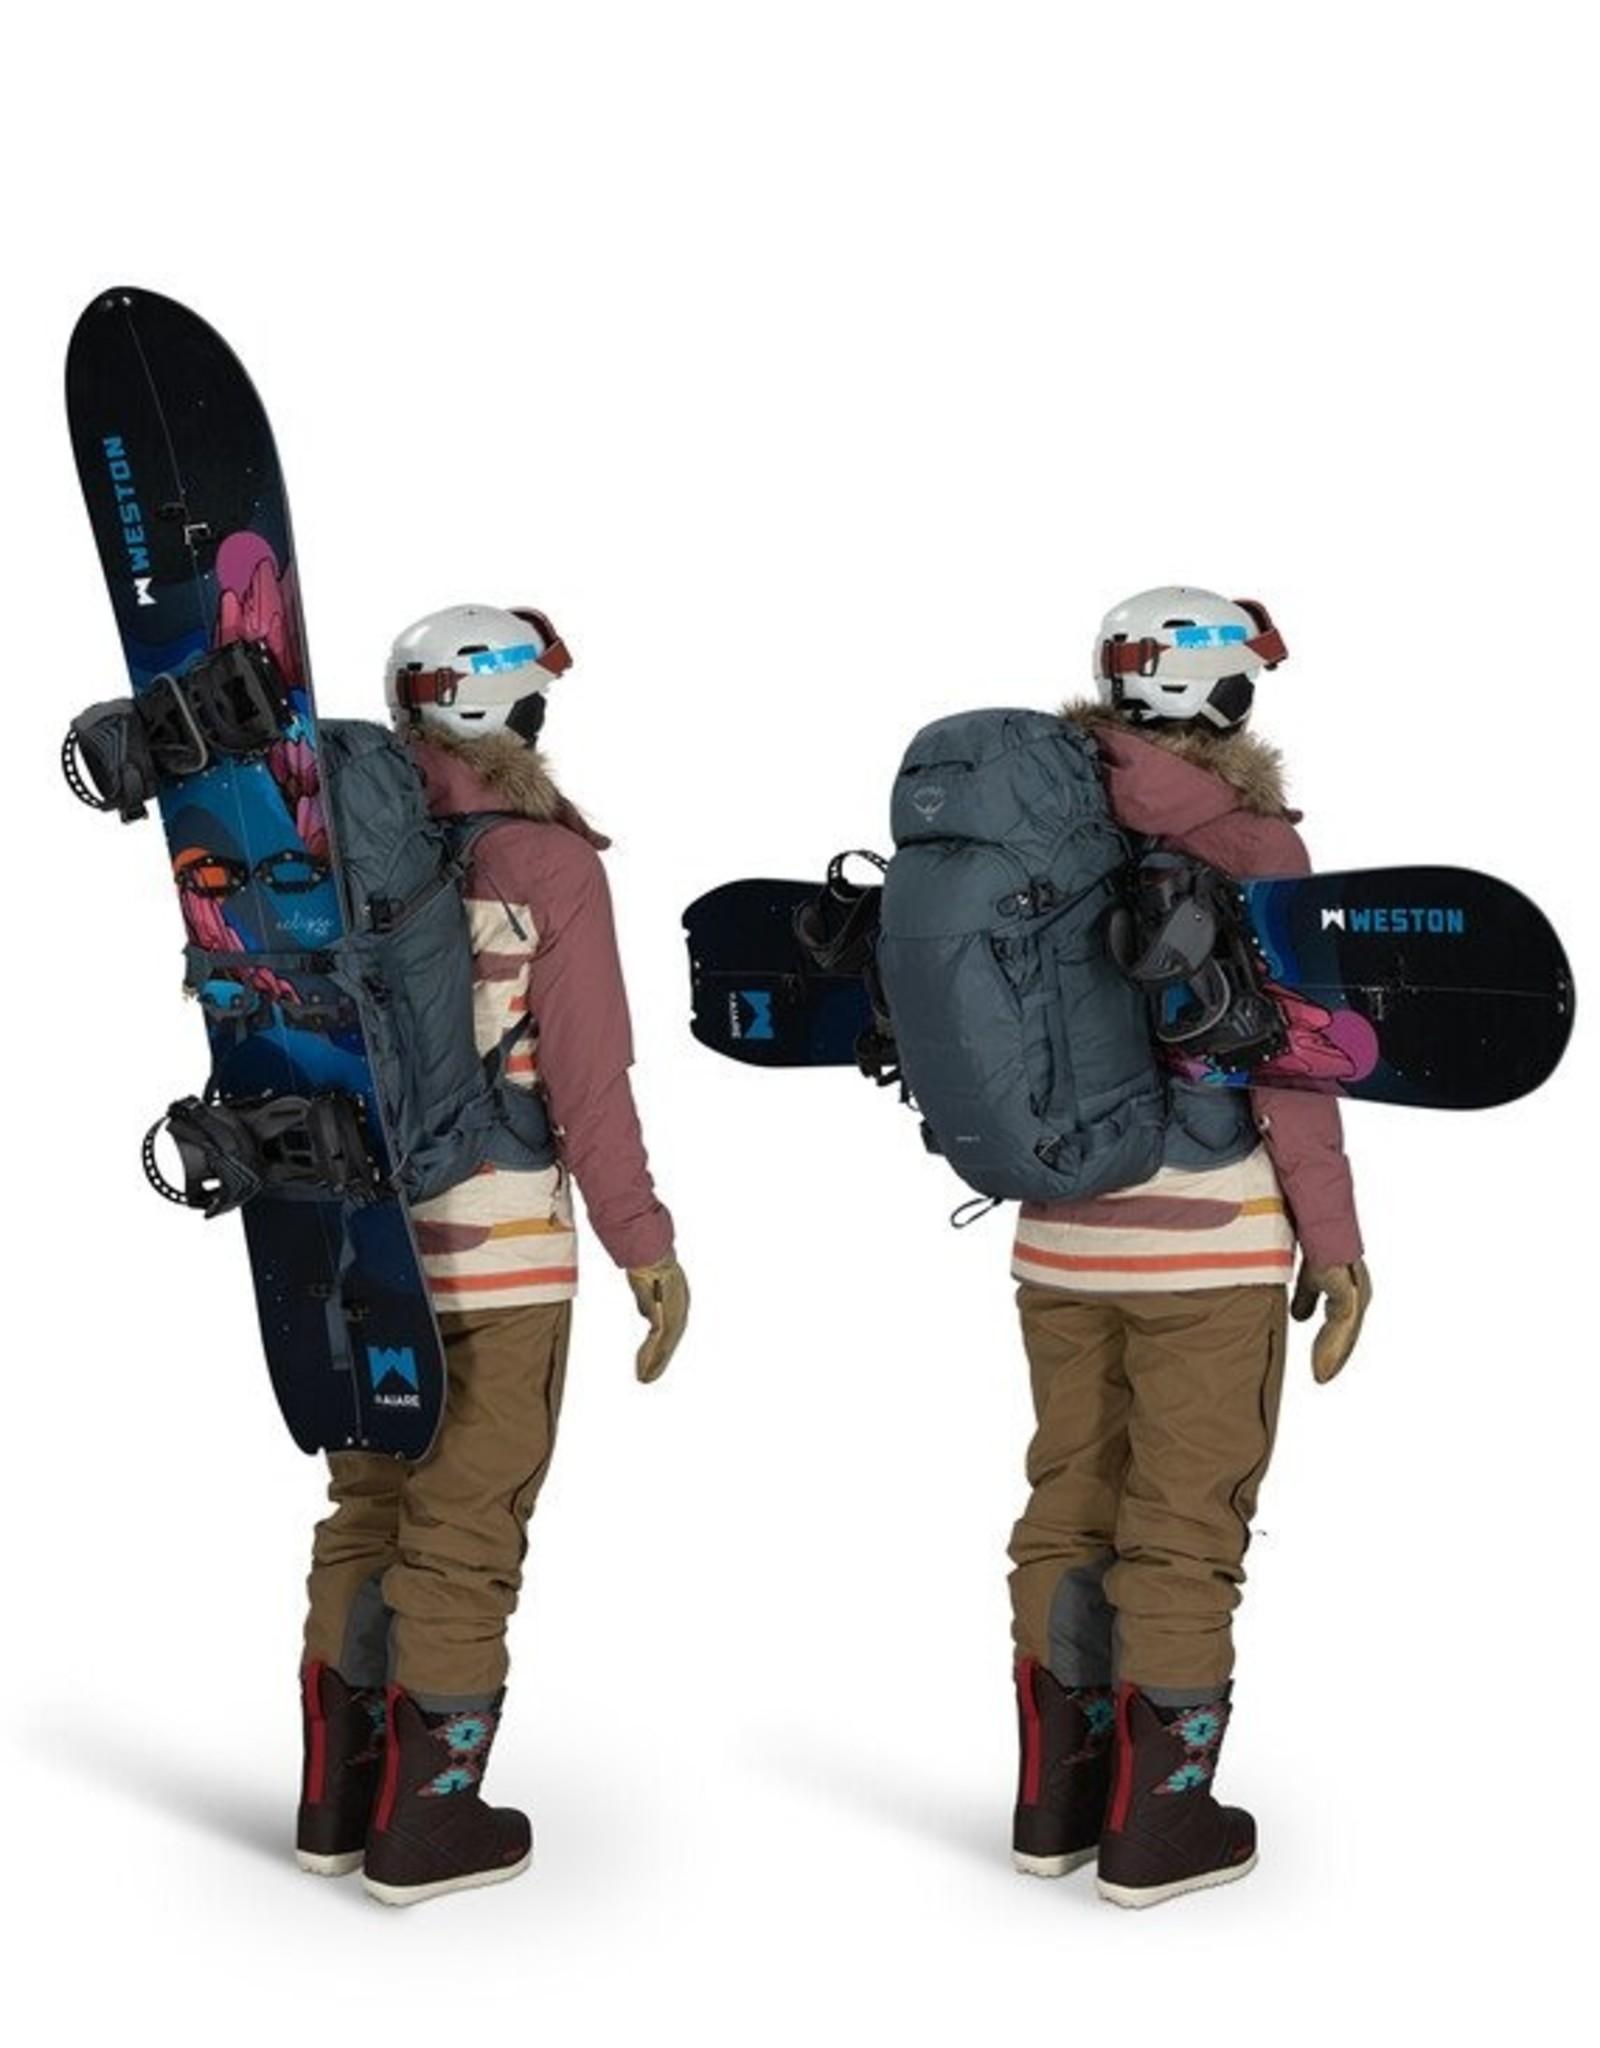 Osprey Osprey Sopris 40 Ski Pack W's  O/S